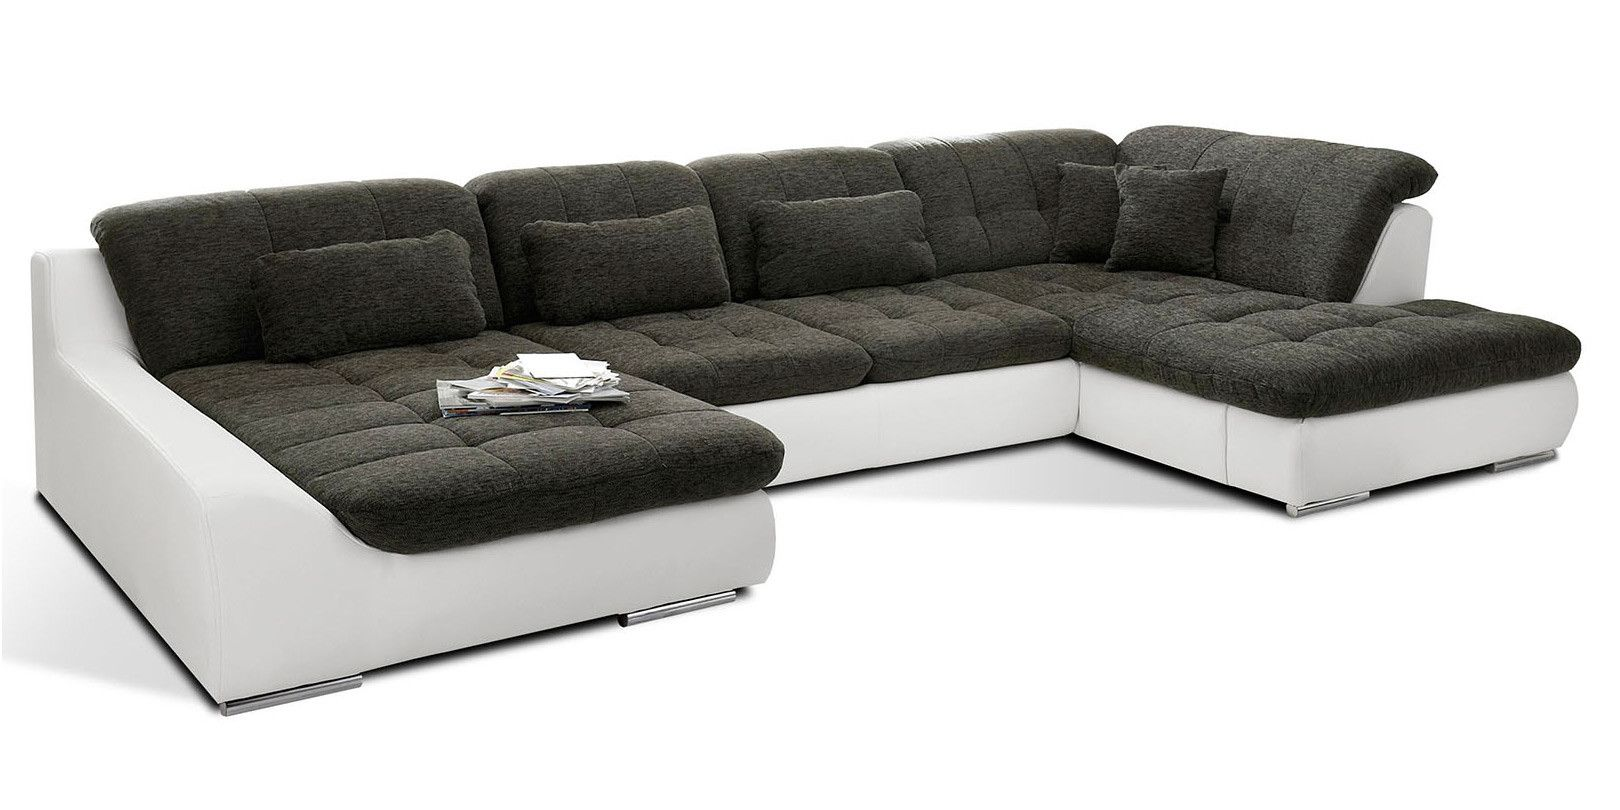 Frohlich Big Sofa Landhaus Dengan Gambar